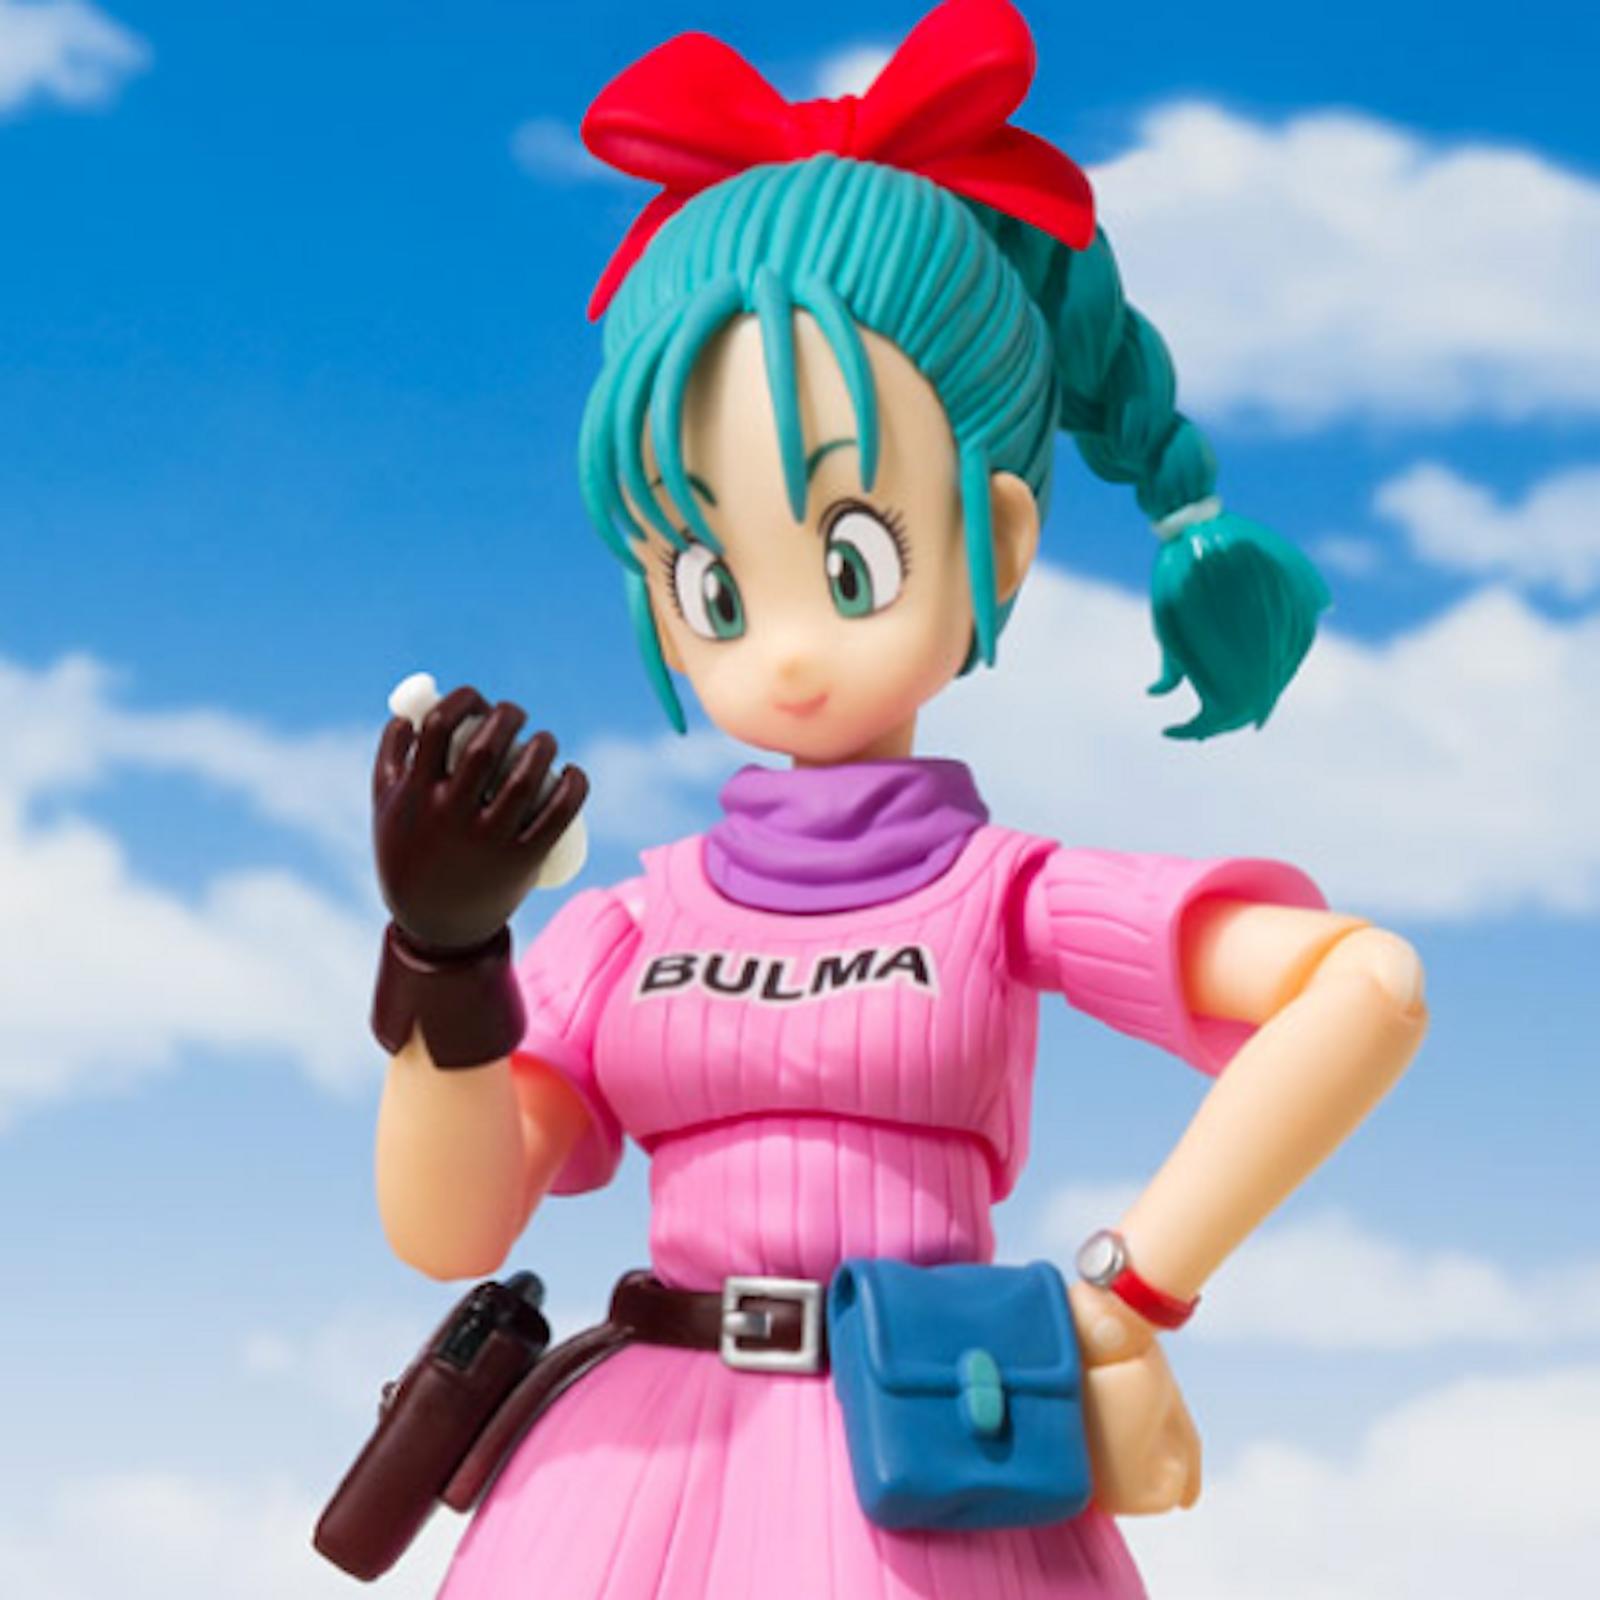 Dragon Ball Z Bulma S.H. Figuarts Action Figure BANDAI JAPAN ANIME